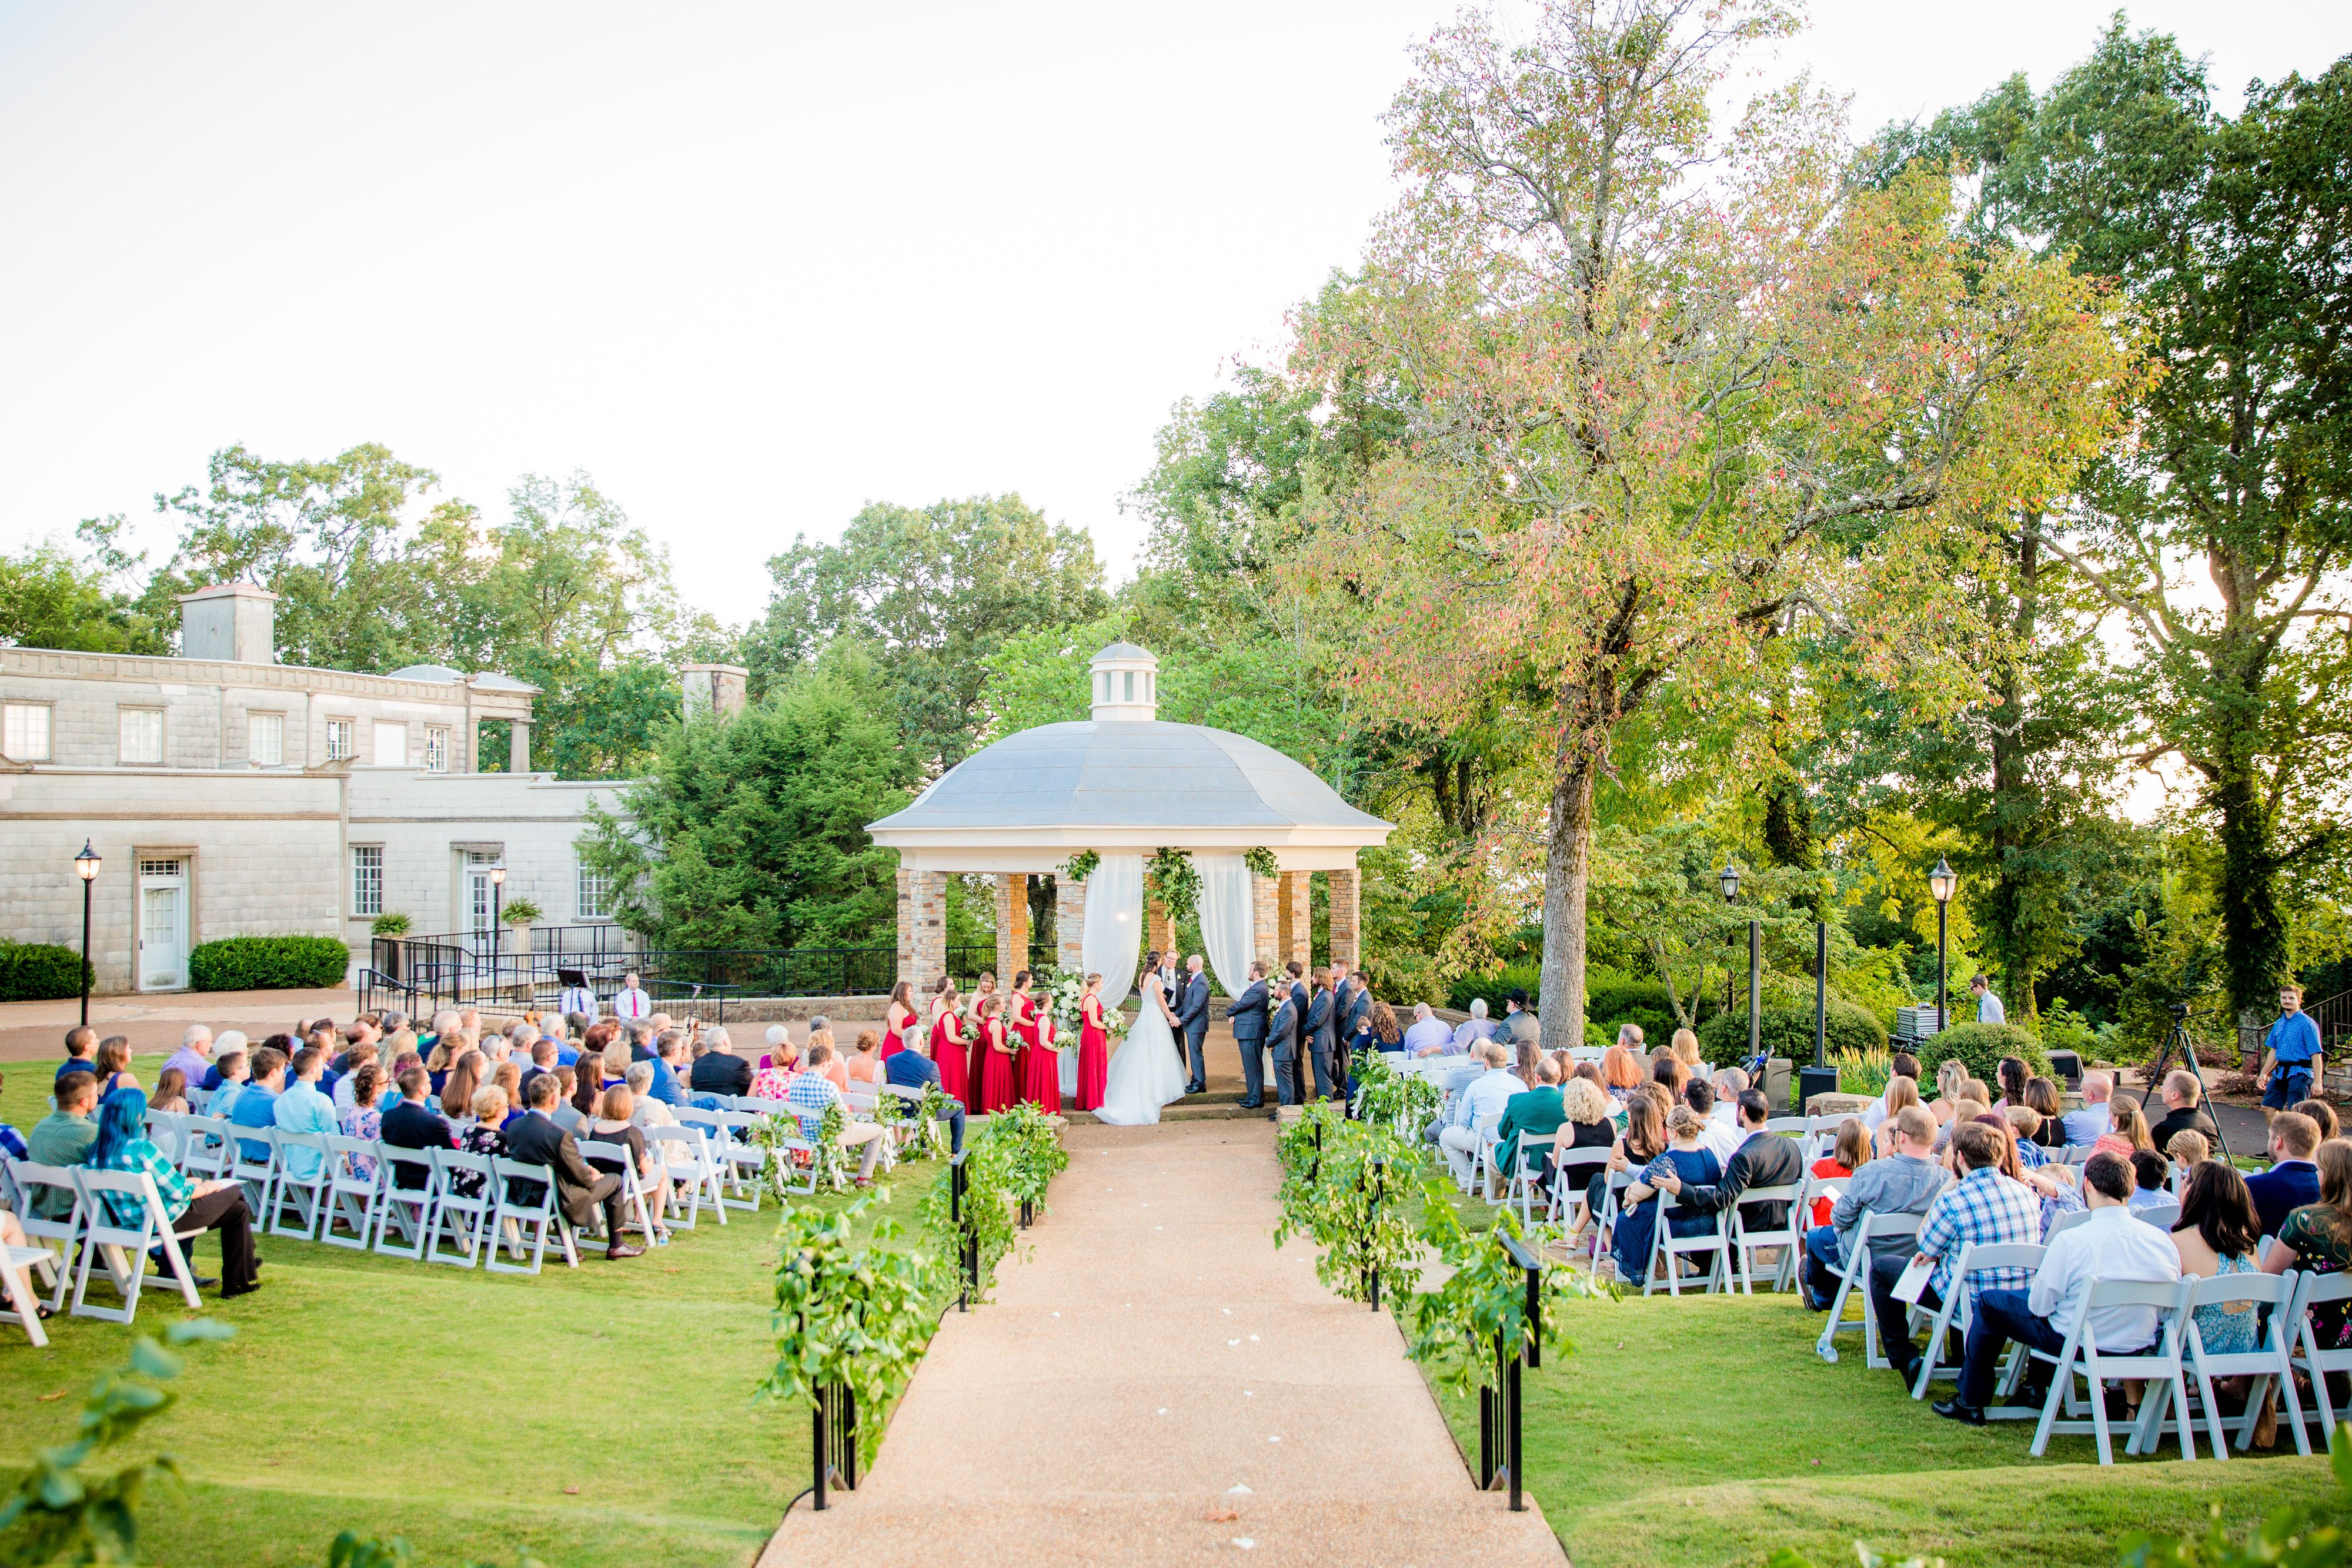 Wedding Ceremony At Burritt On The Mountain Romantic Wedding Venue Ceremony Inspiration Greenery Wedding